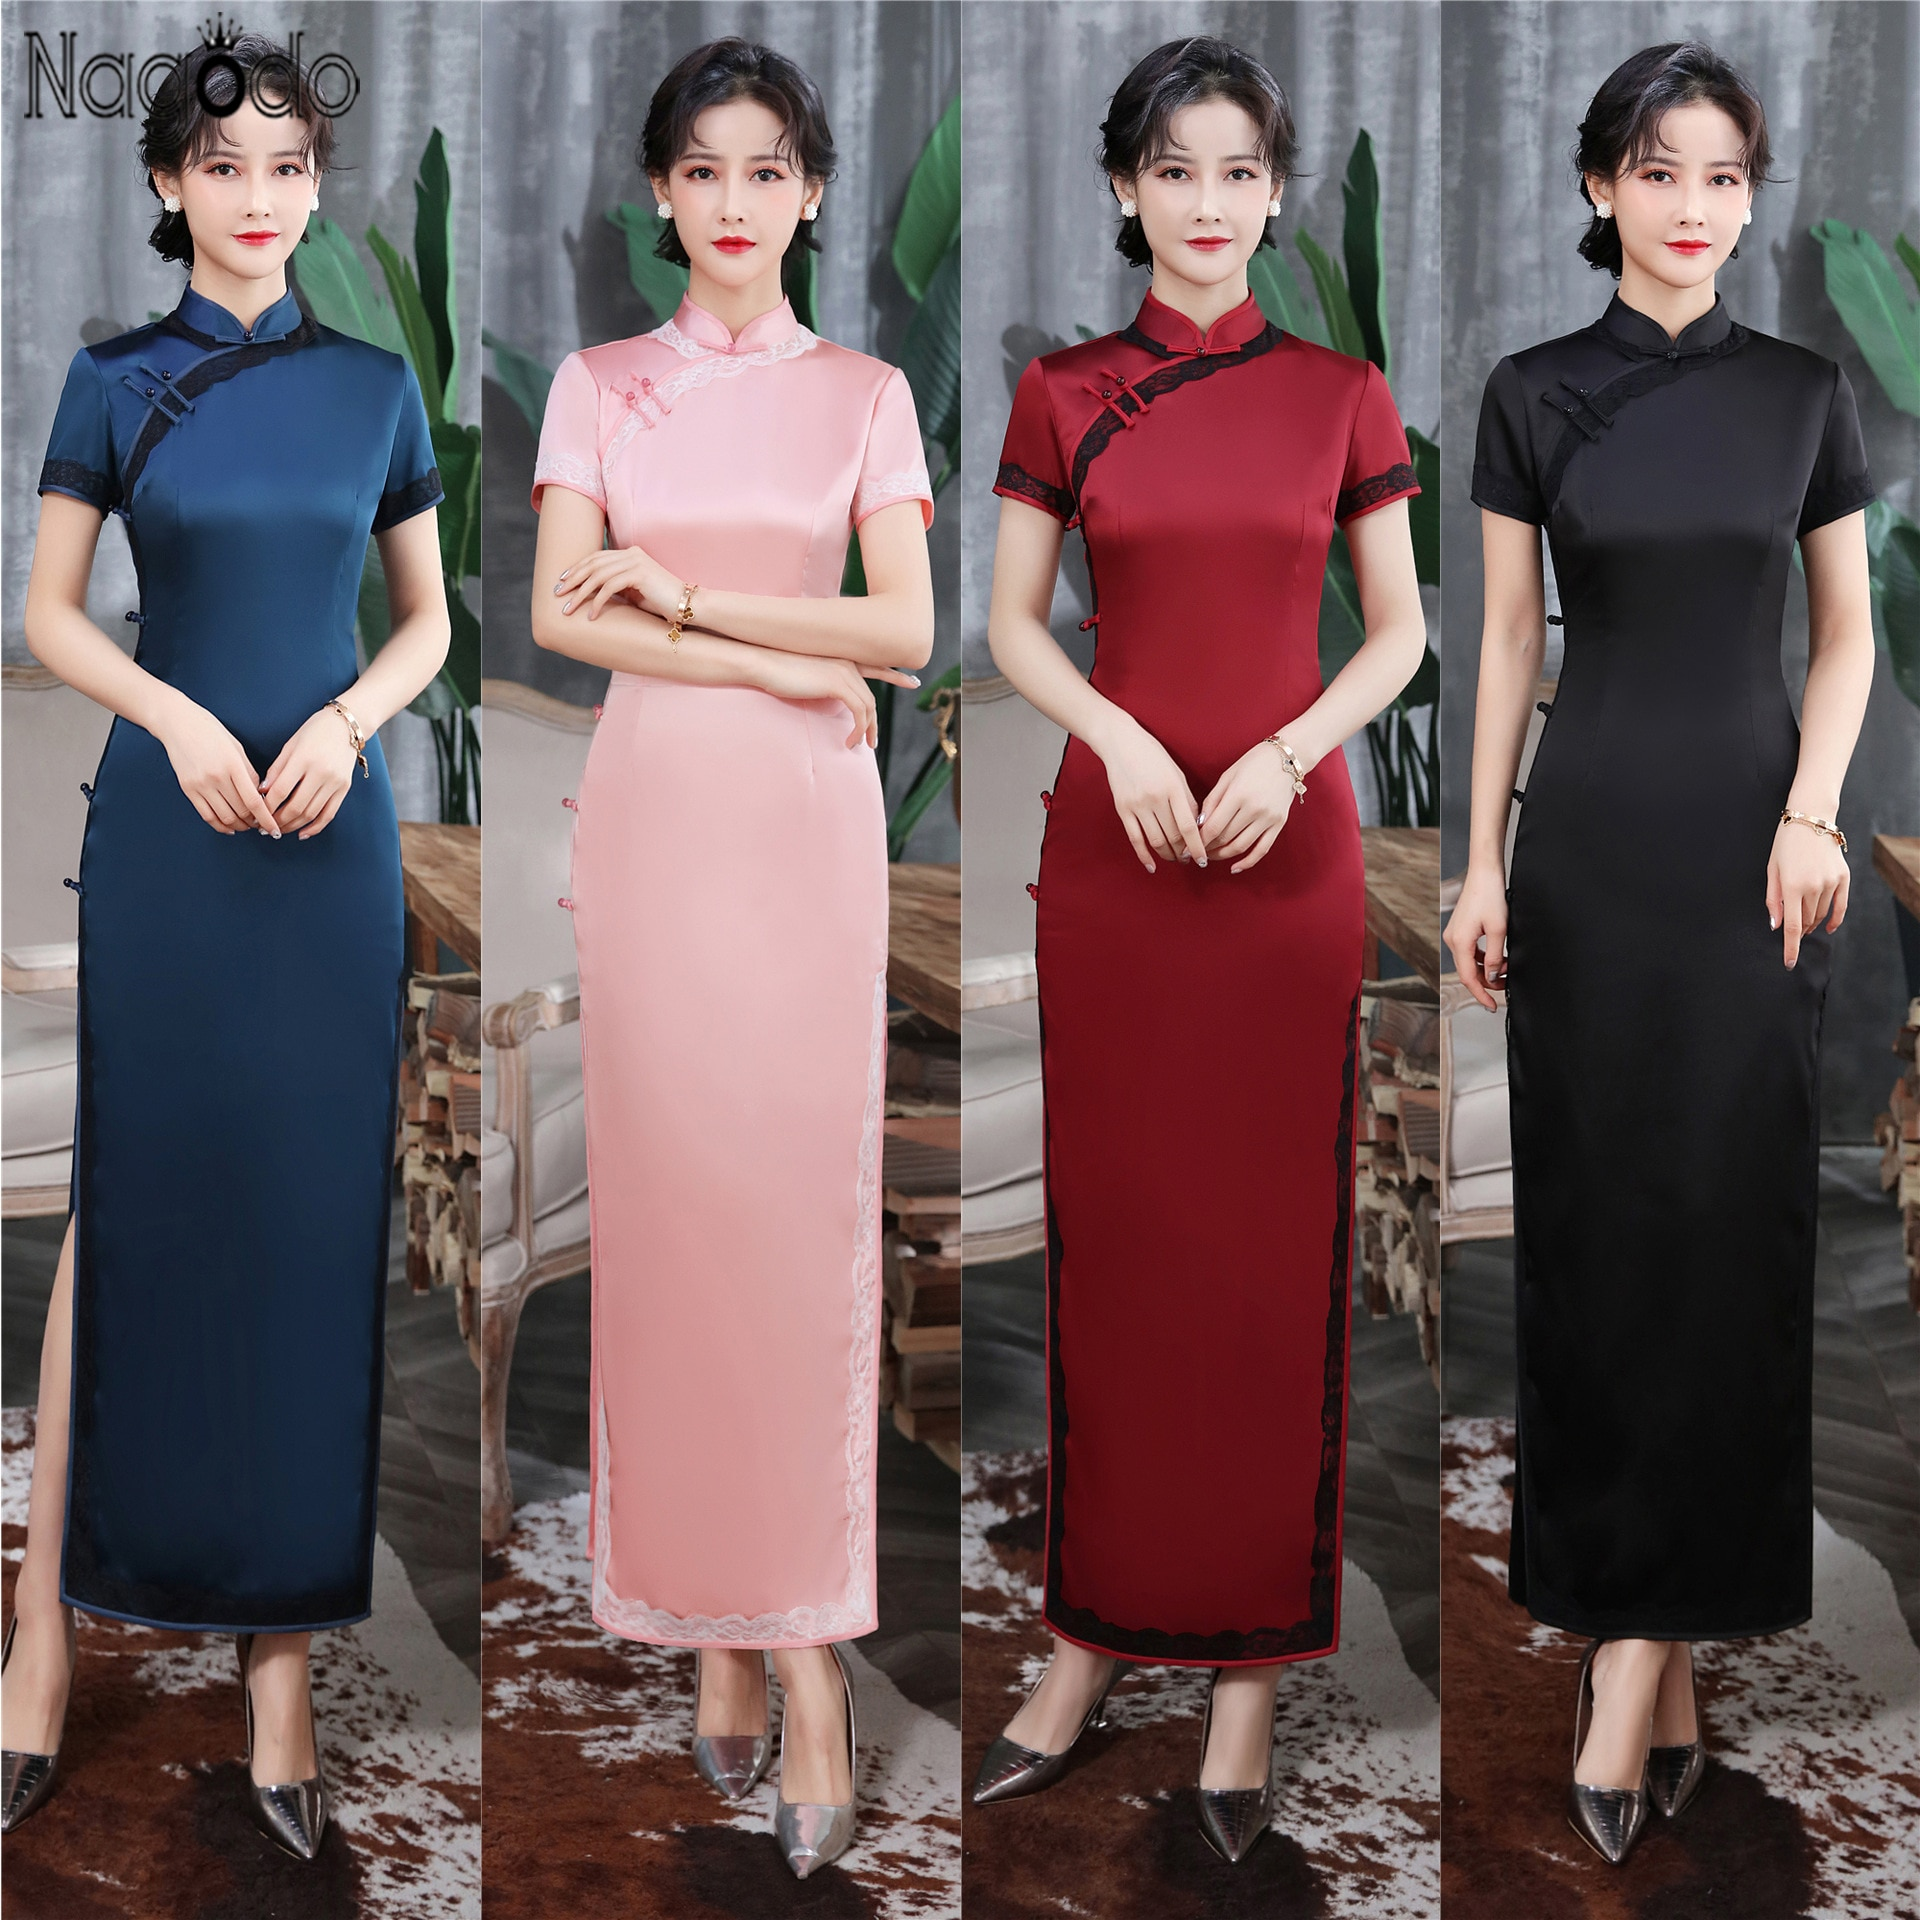 Nagodo Chinese Evening Dress 2020 Retro Modified Short Sleeve Silk Chinese Dress Women Cheongsam Plus Size Slim Long Qipao Dress